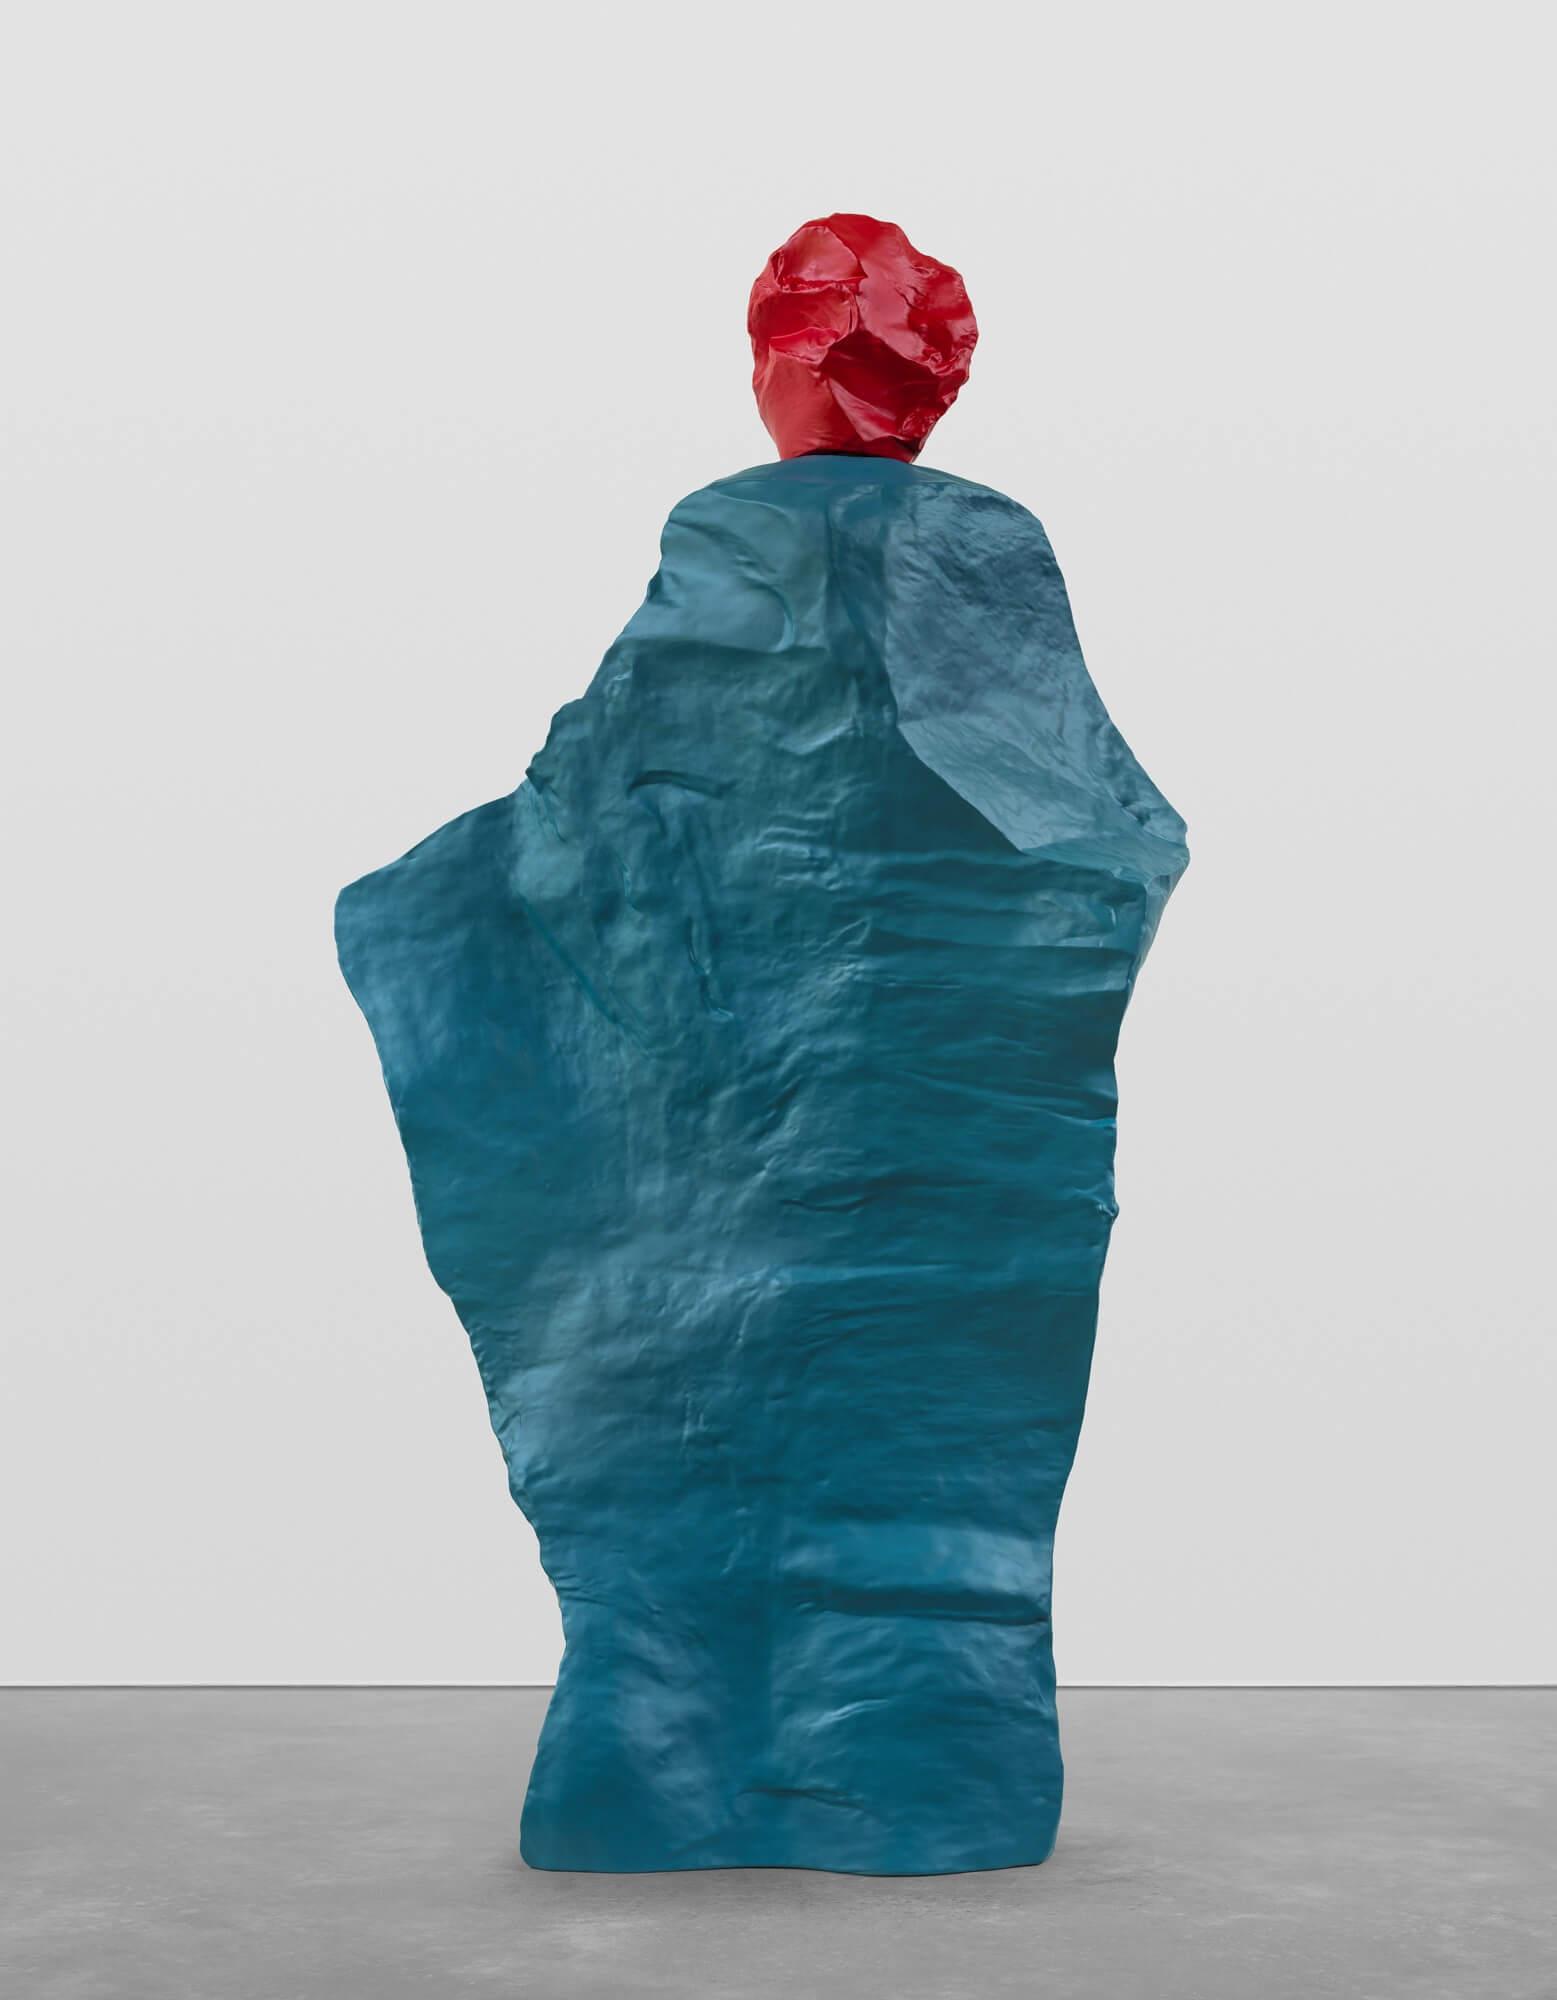 red green monk | UGO RONDINONE